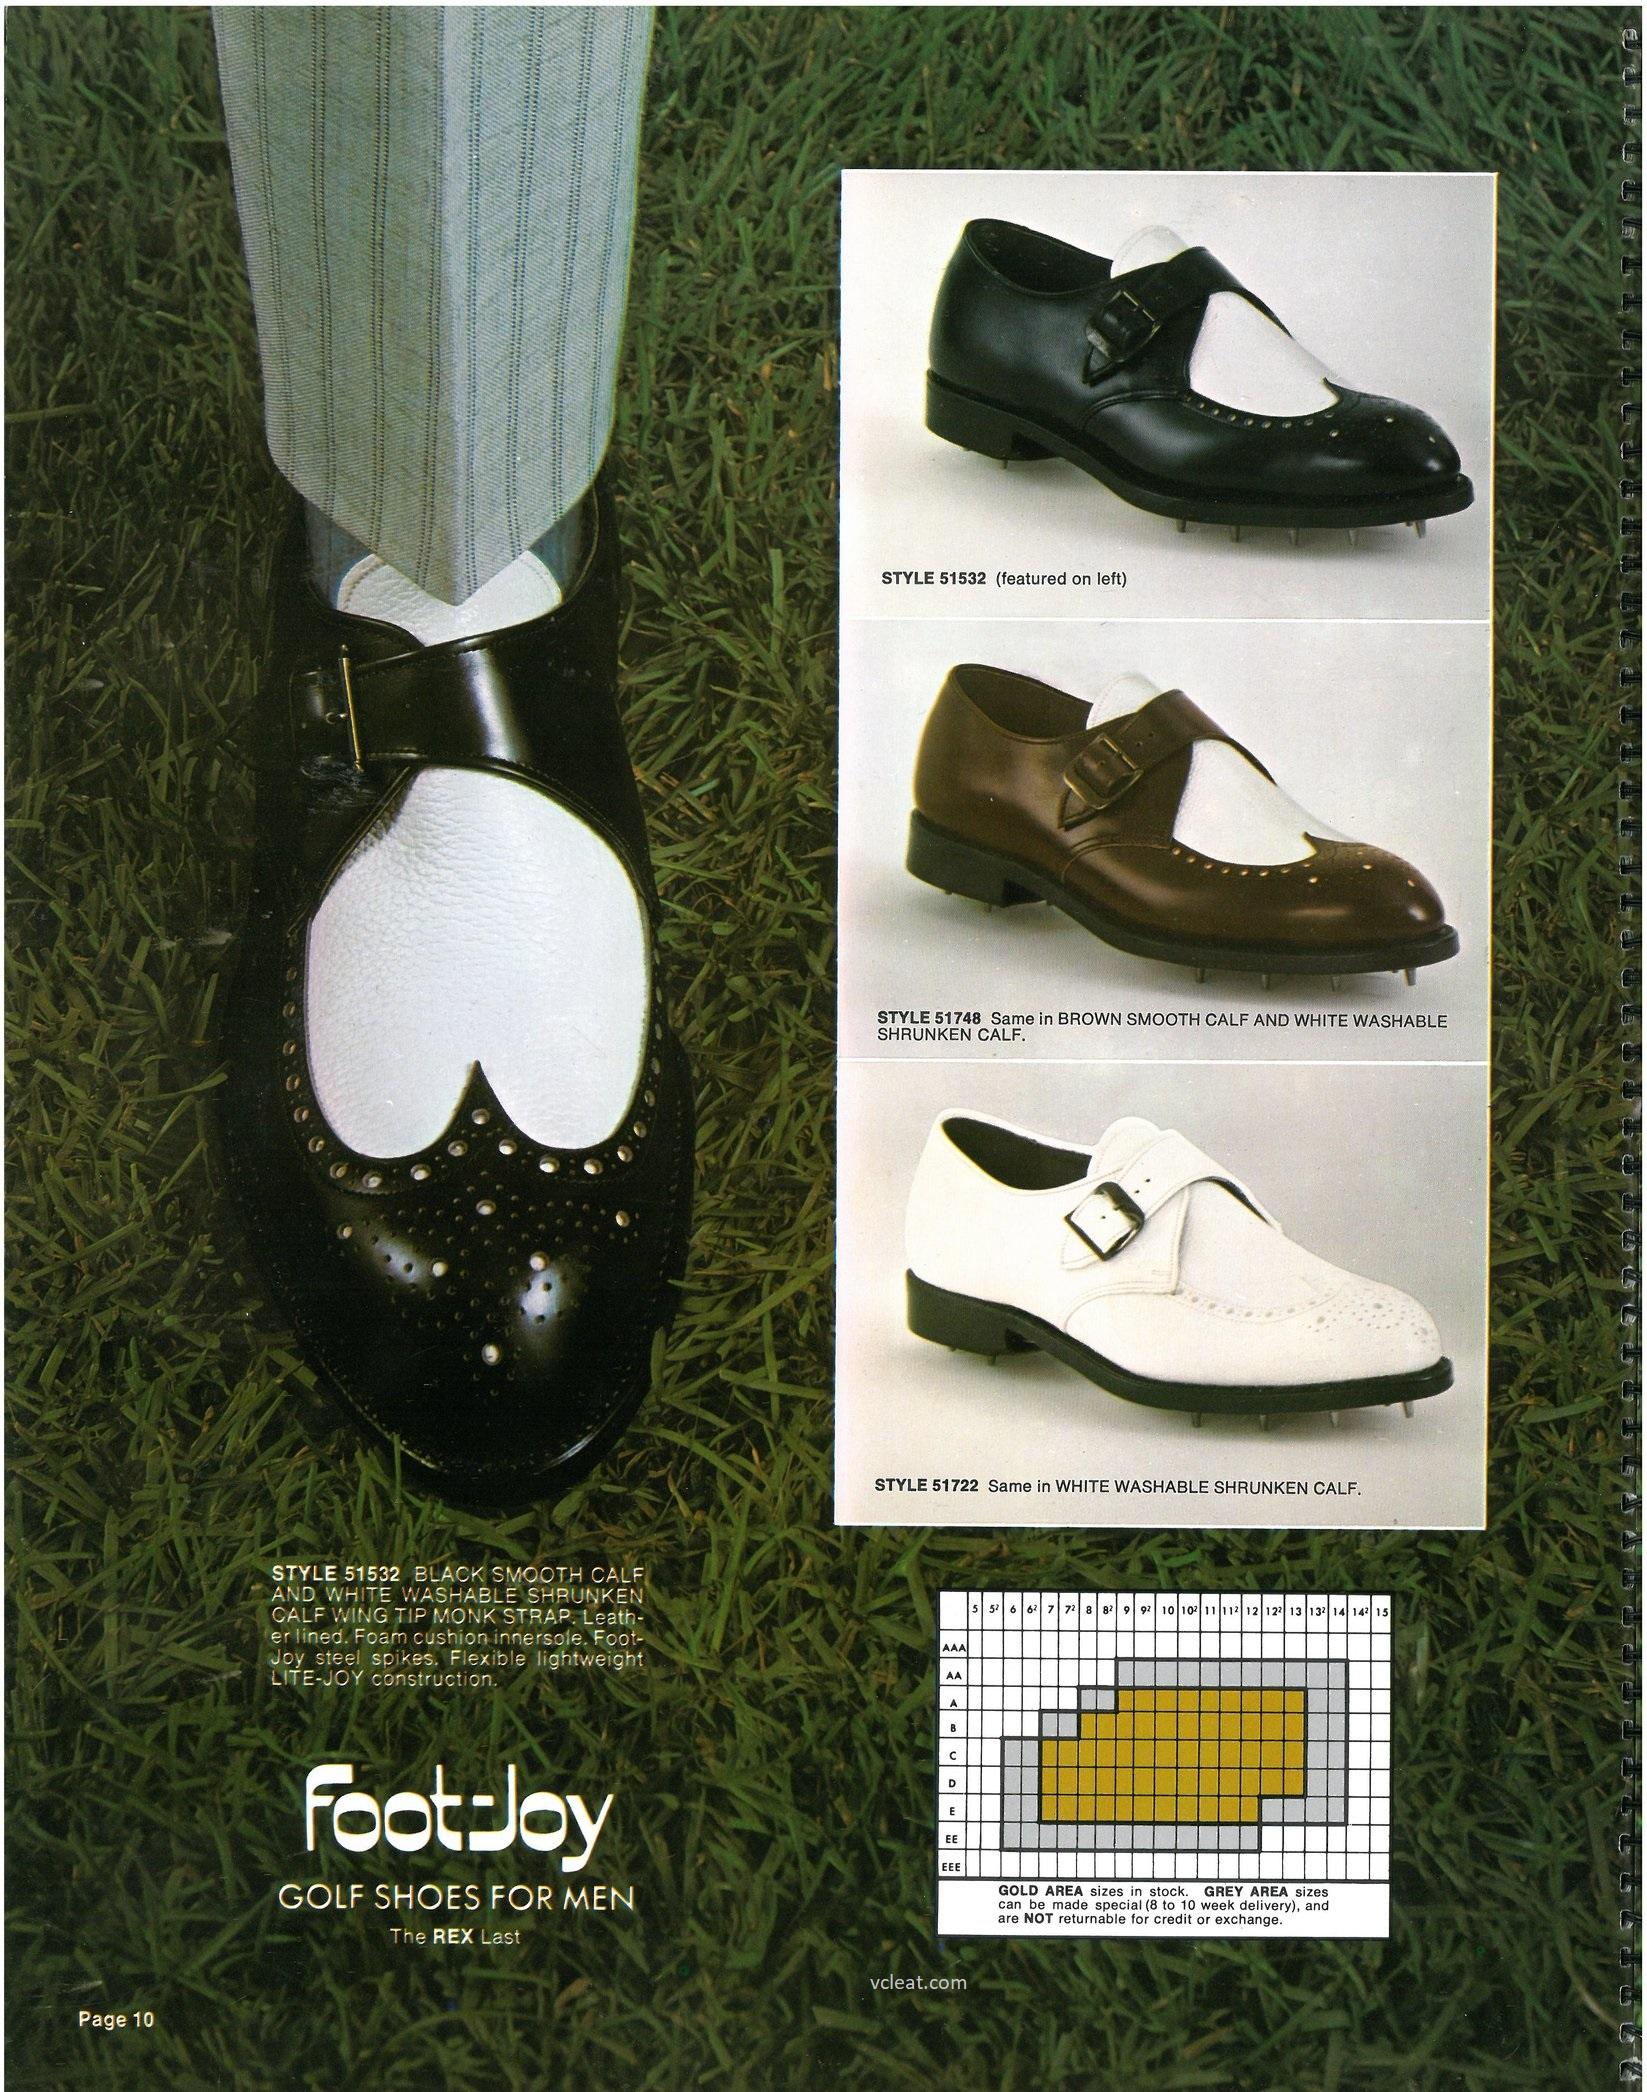 Vintage FootJoy Golf 51532 51748 51722